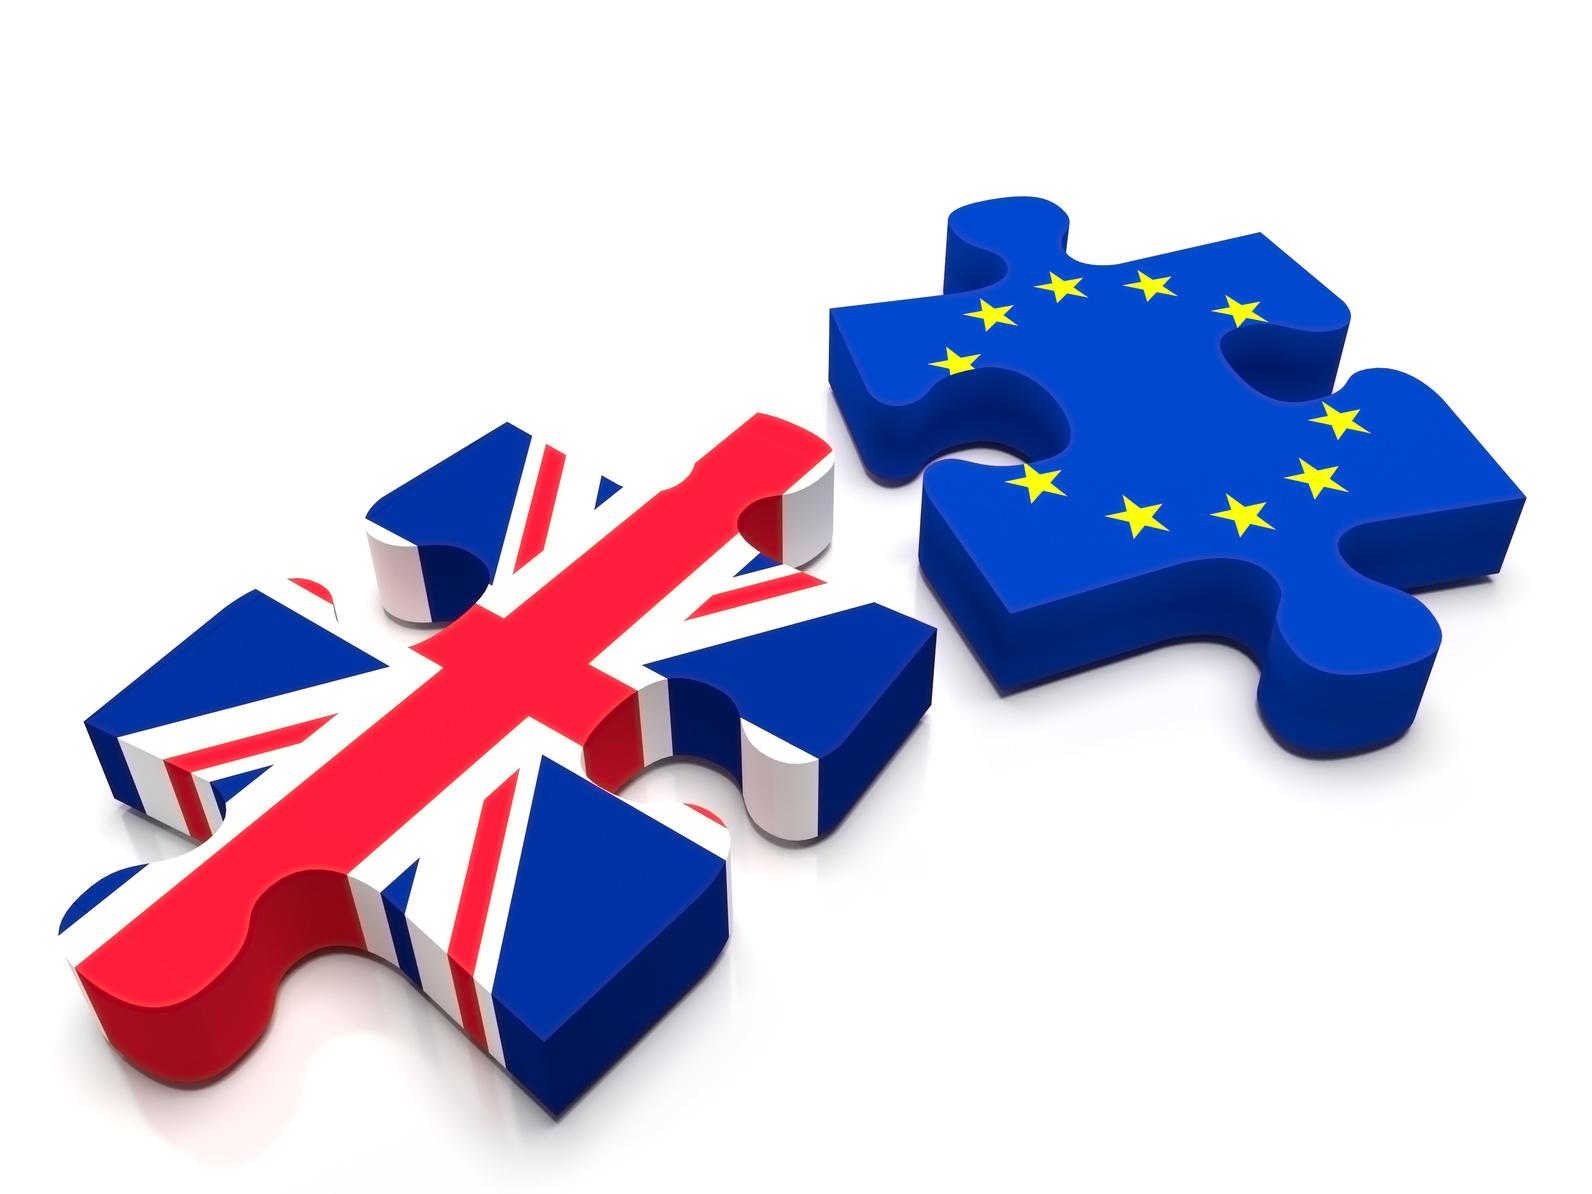 Jigsaw puzzle European Union (EU) vs United Kingdom (UK)